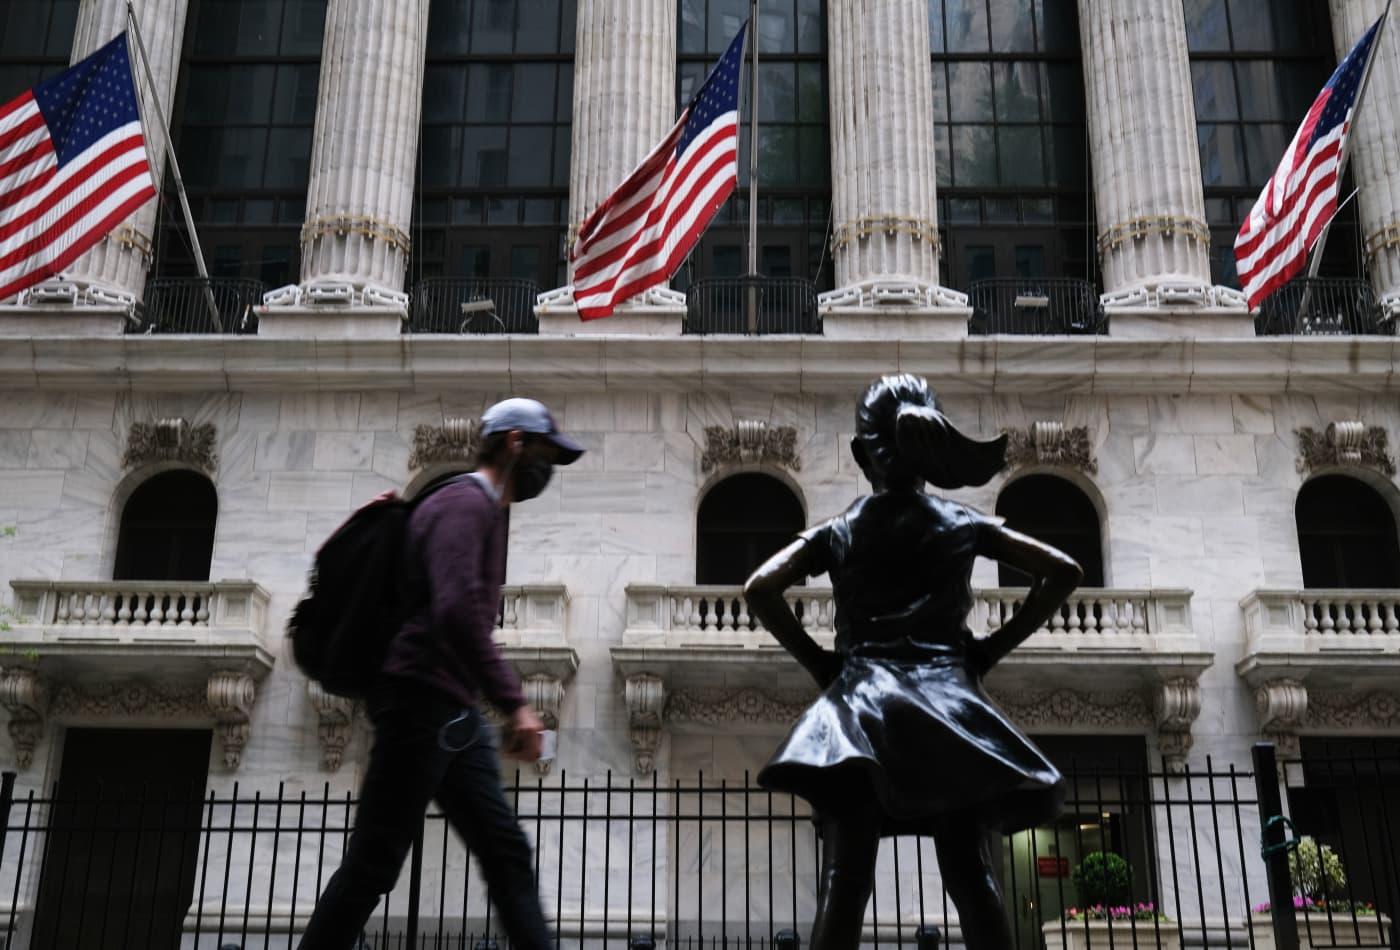 Jim Cramer identifies popular stock picks among young investors